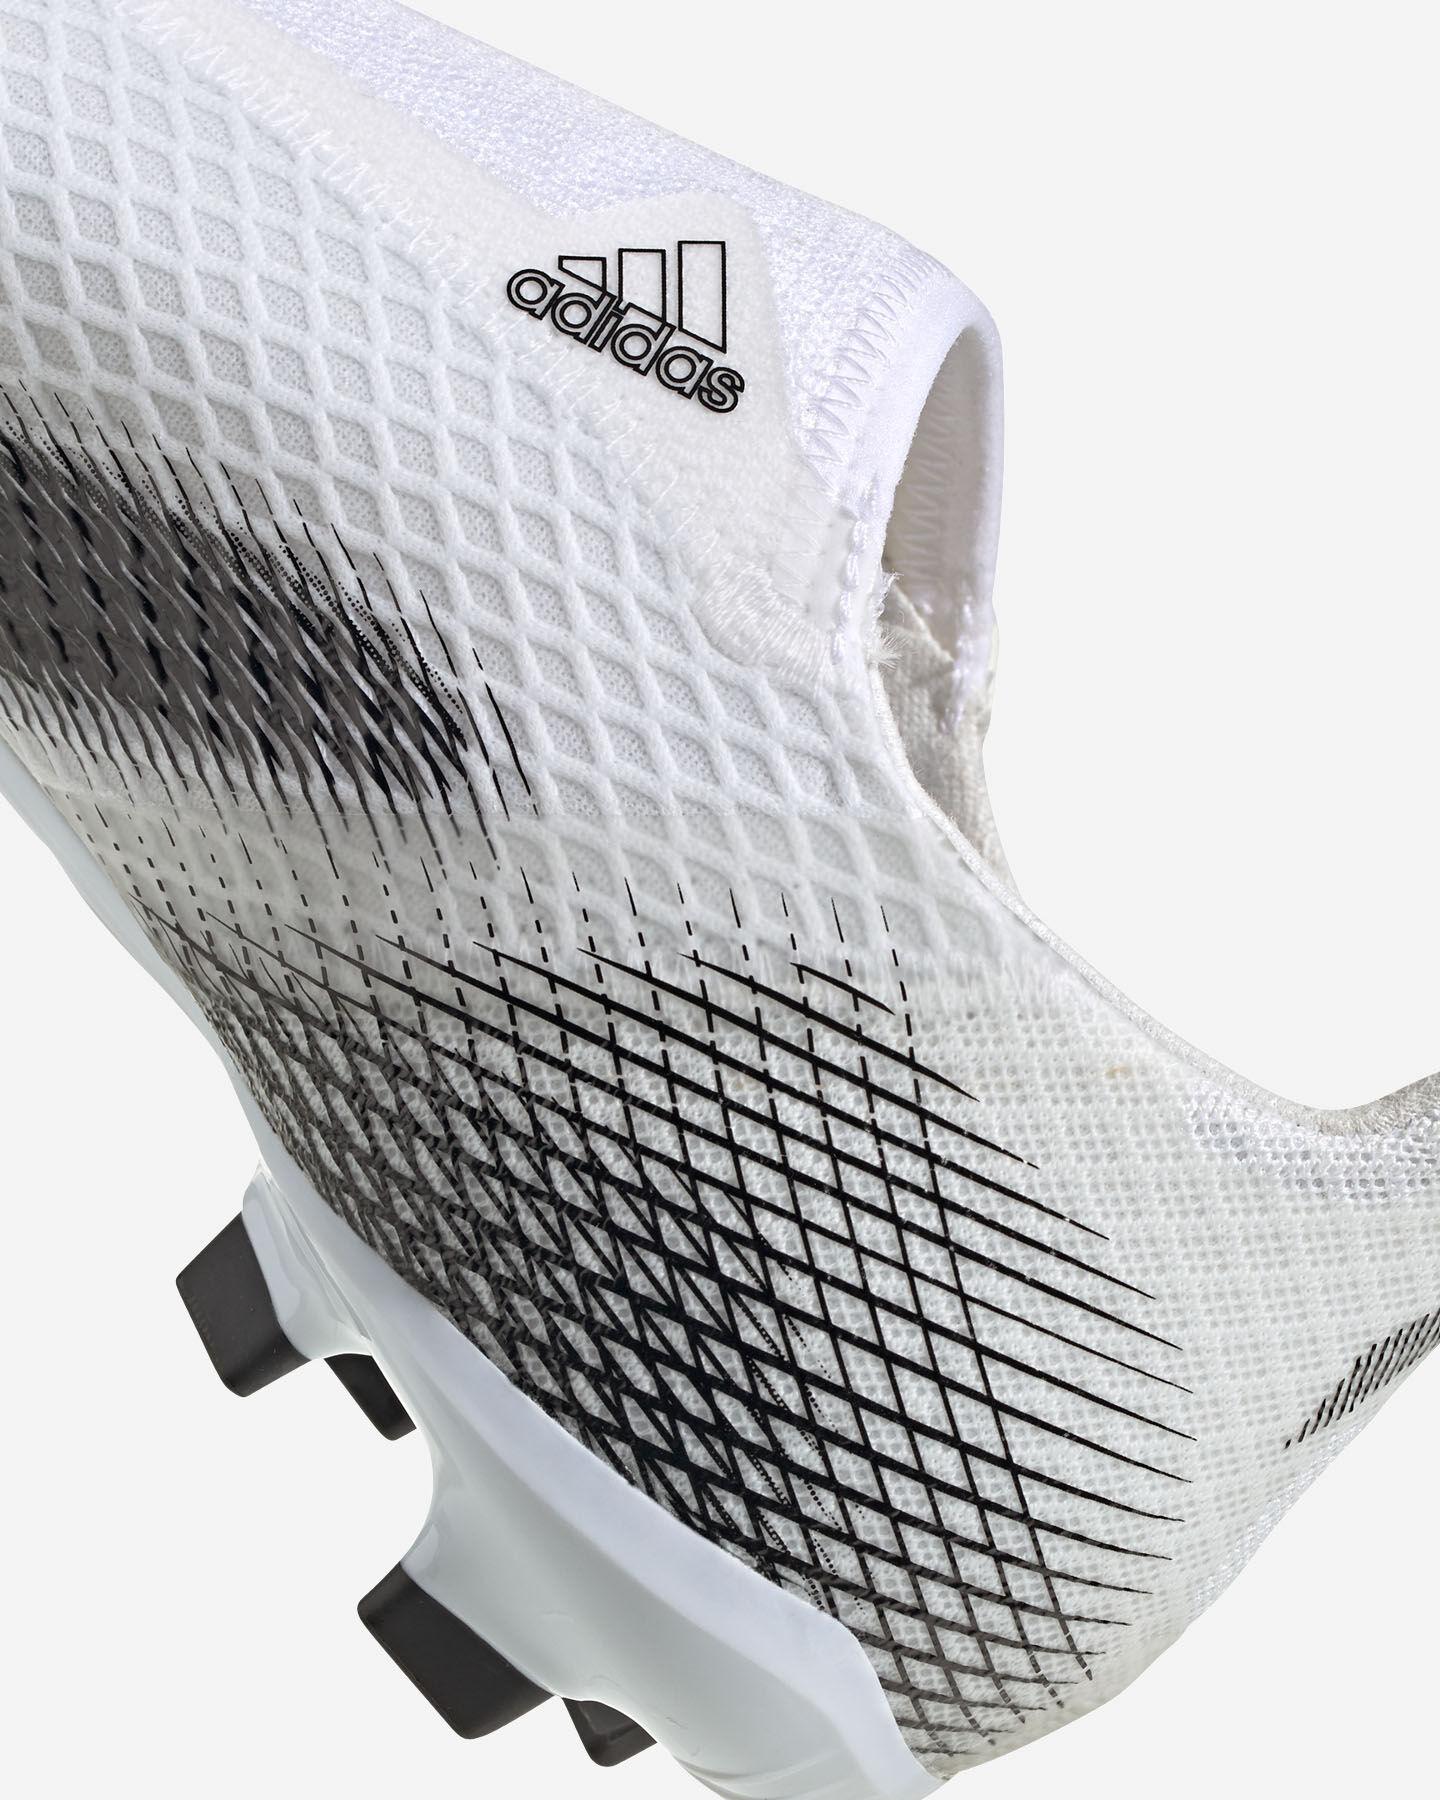 Scarpe calcio ADIDAS X GHOSTED 3 LL FG JR S5216987 scatto 4